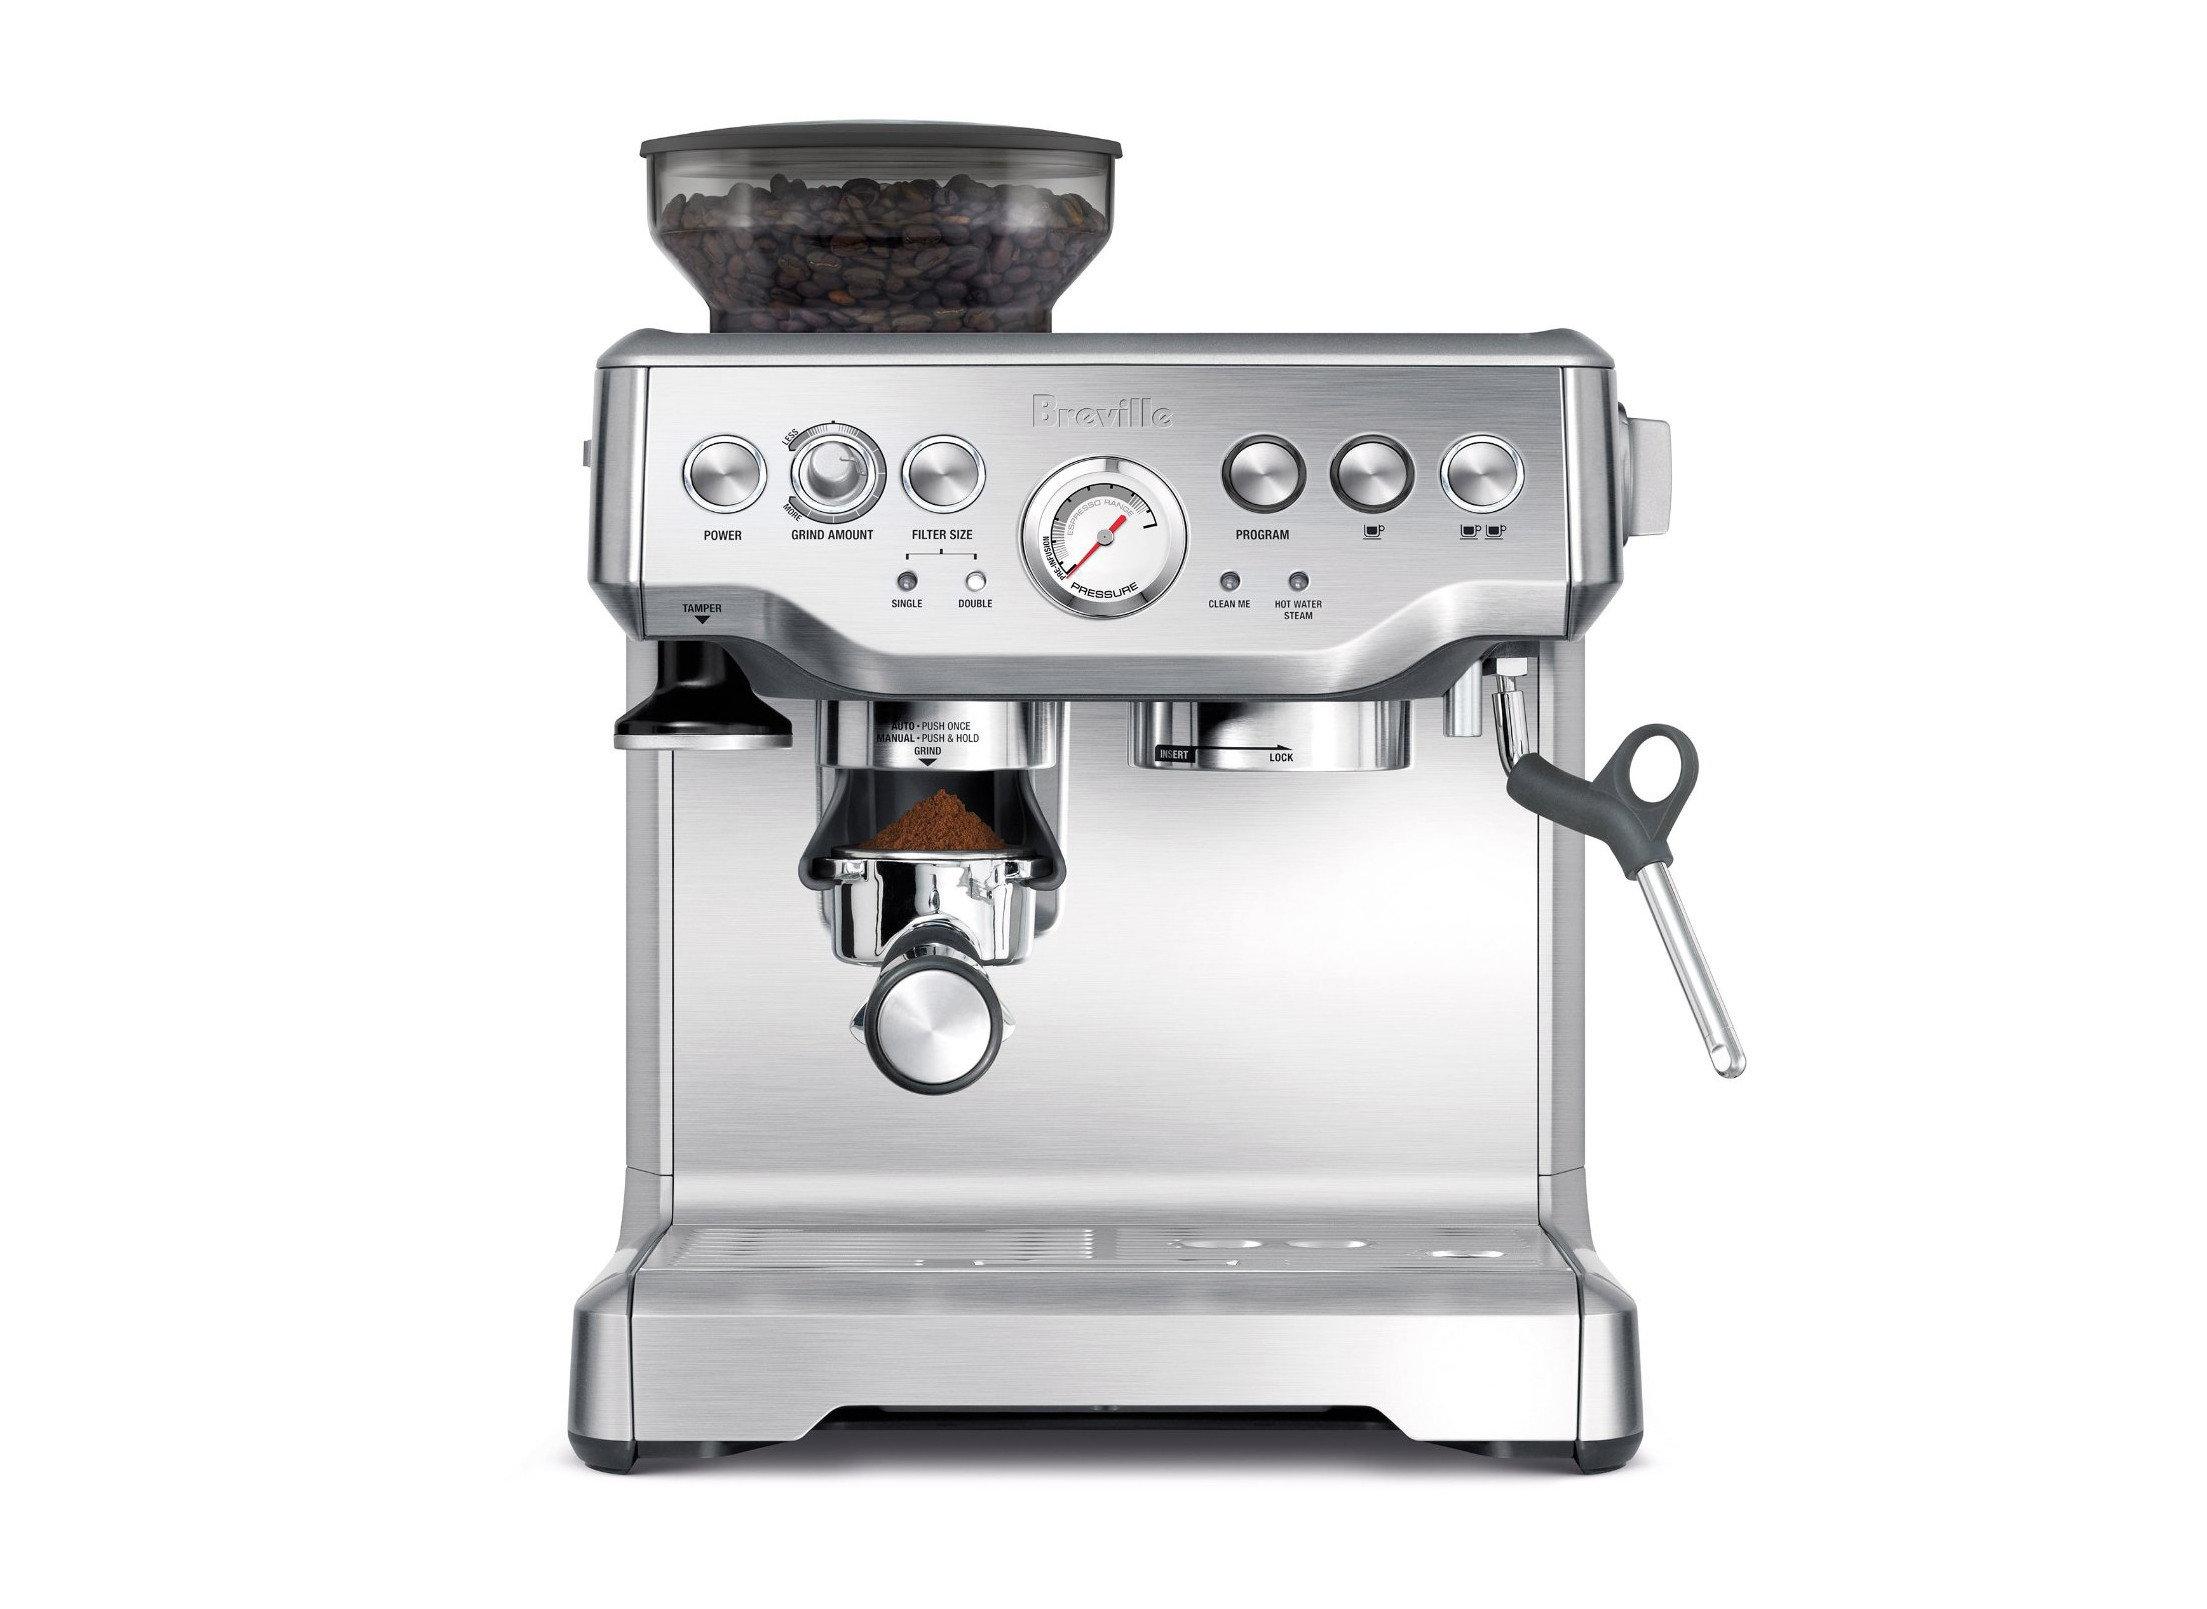 Travel Shop small appliance appliance espresso machine coffeemaker product home appliance kitchen appliance product design machine kettle